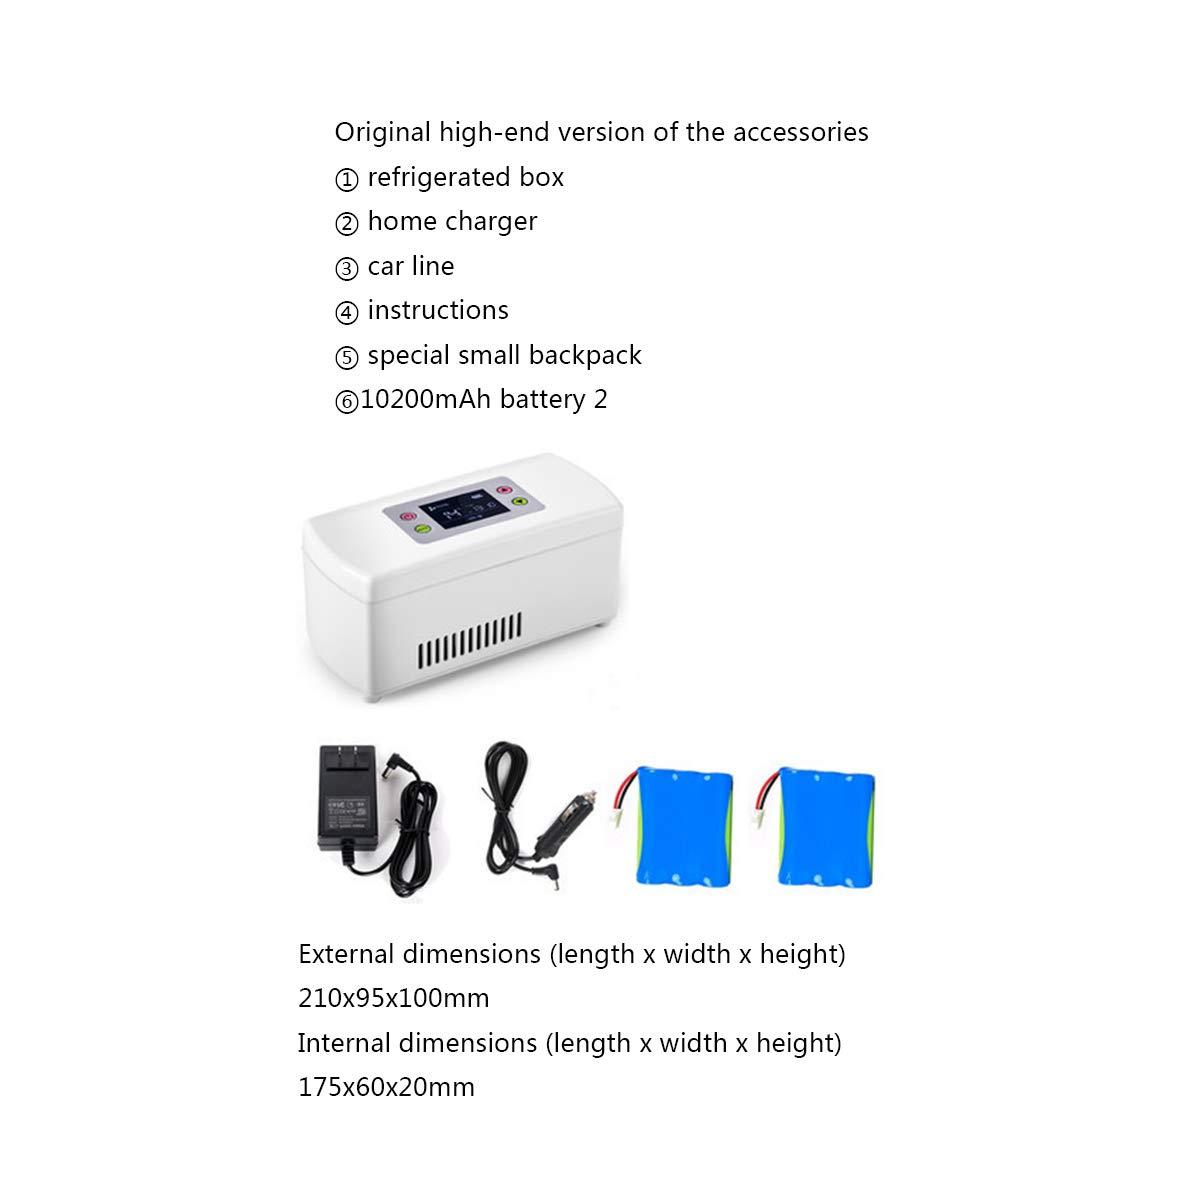 Dapang USB Portable Insulin Cooler Case,HD LED Display Drug Reefer, Intelligent Refrigeration Refrigerated Box,2-8 Degree Insulation car Mini Refrigerator for Insulin Pen,2